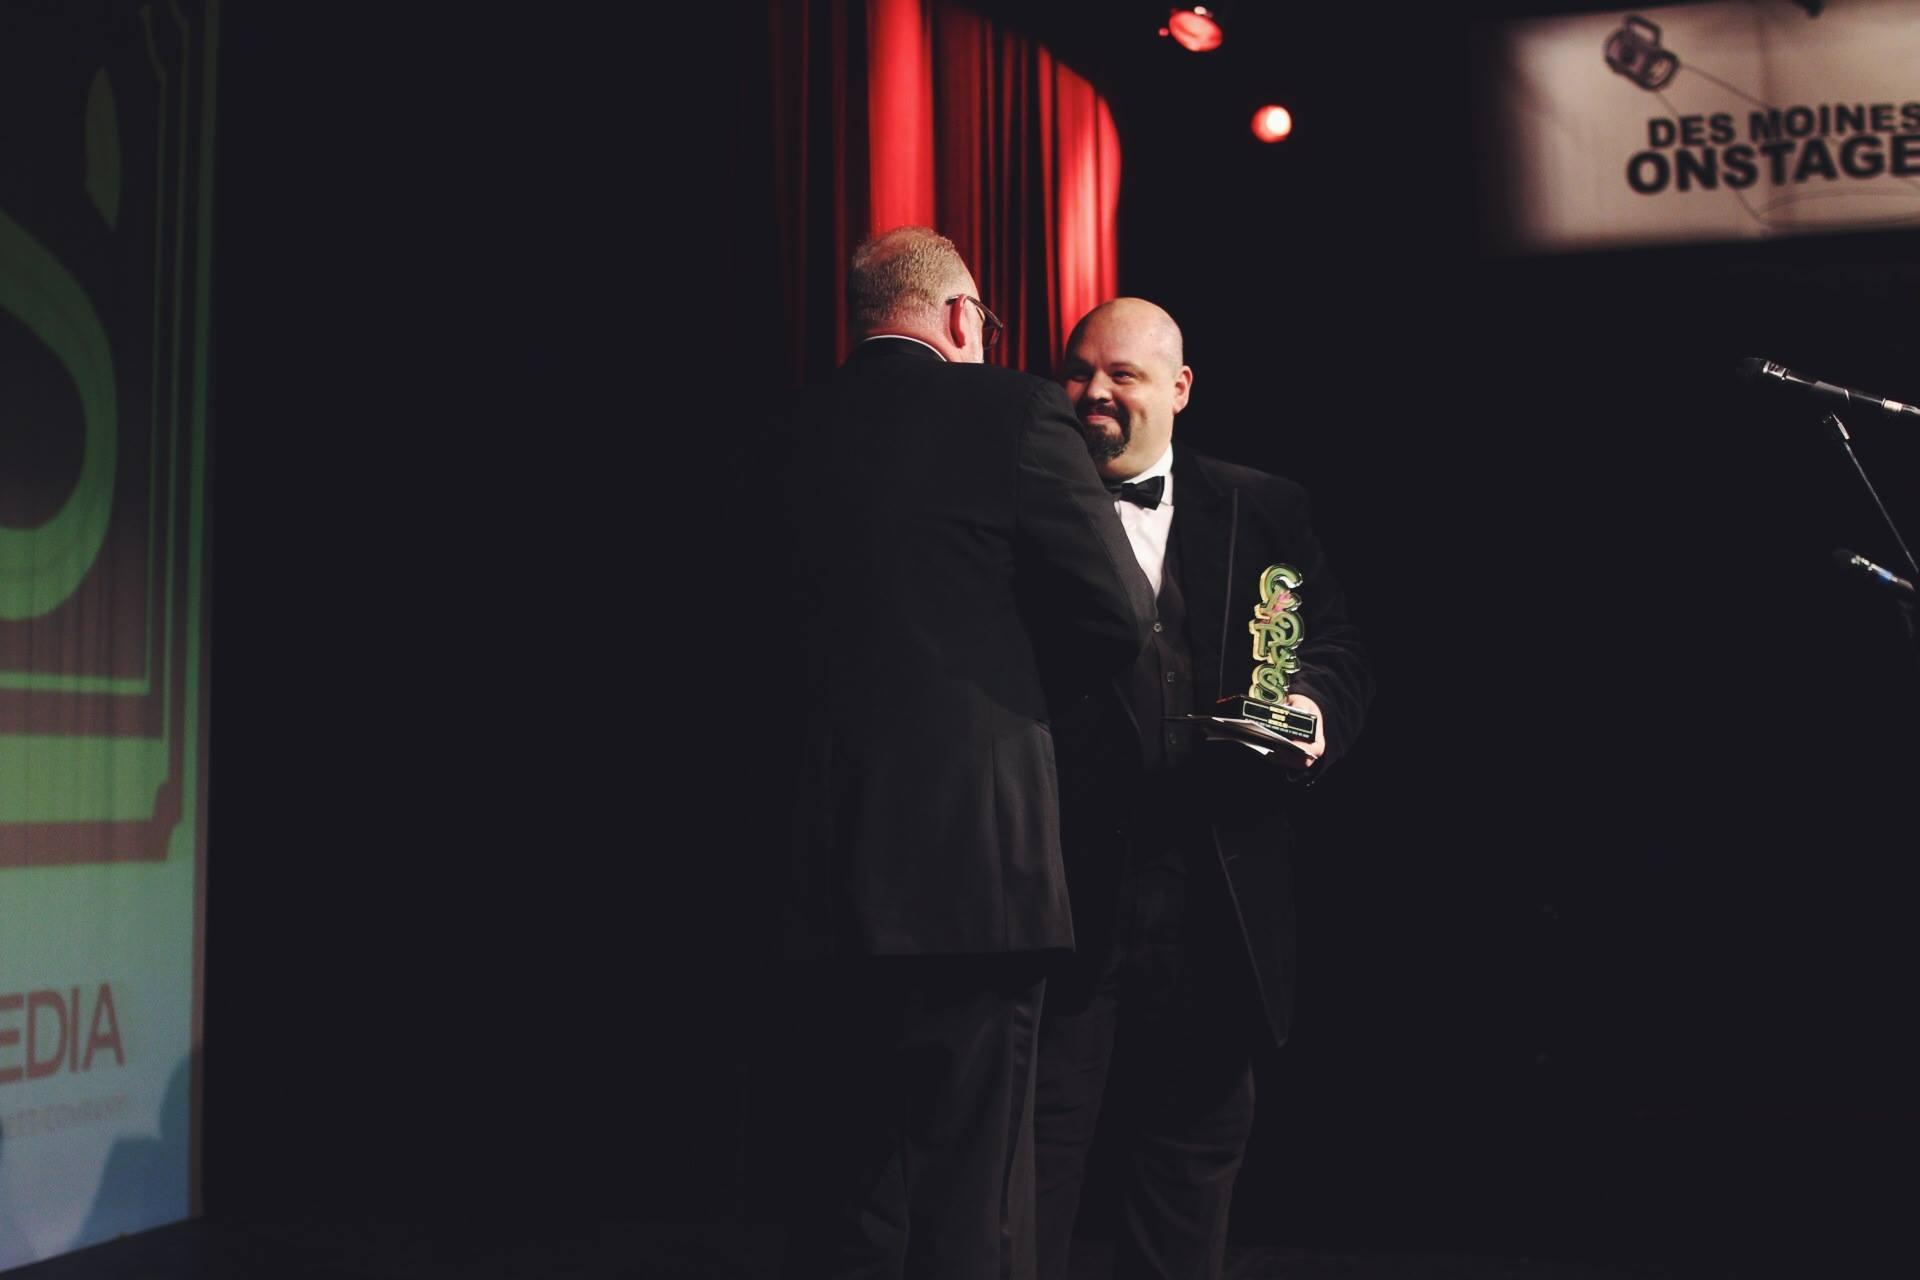 Farmboy Cloris Awards Statue Photo